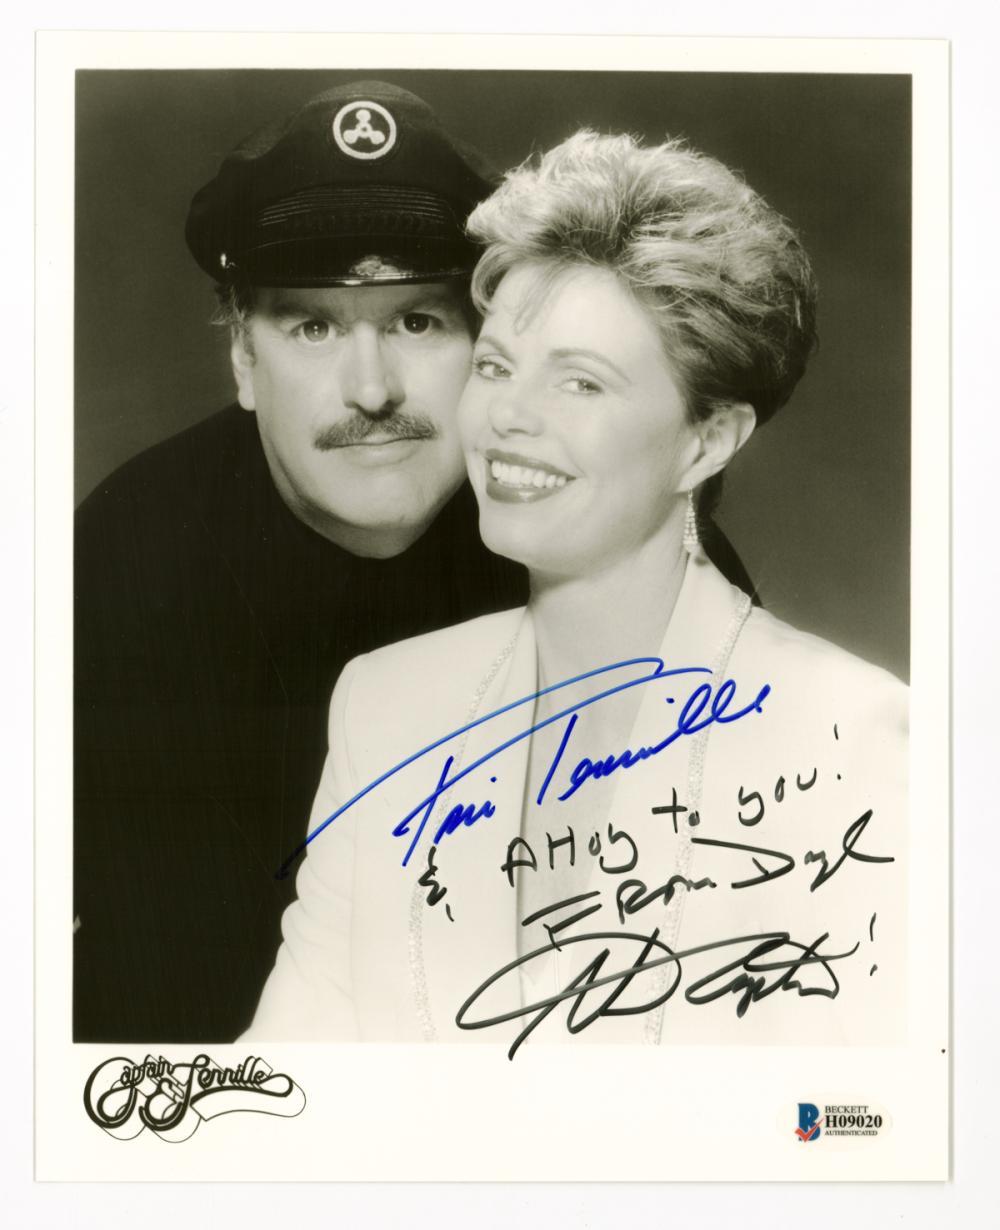 Lot 687: Captain and Tenille Signed 8 x 10 Photo BAS COA